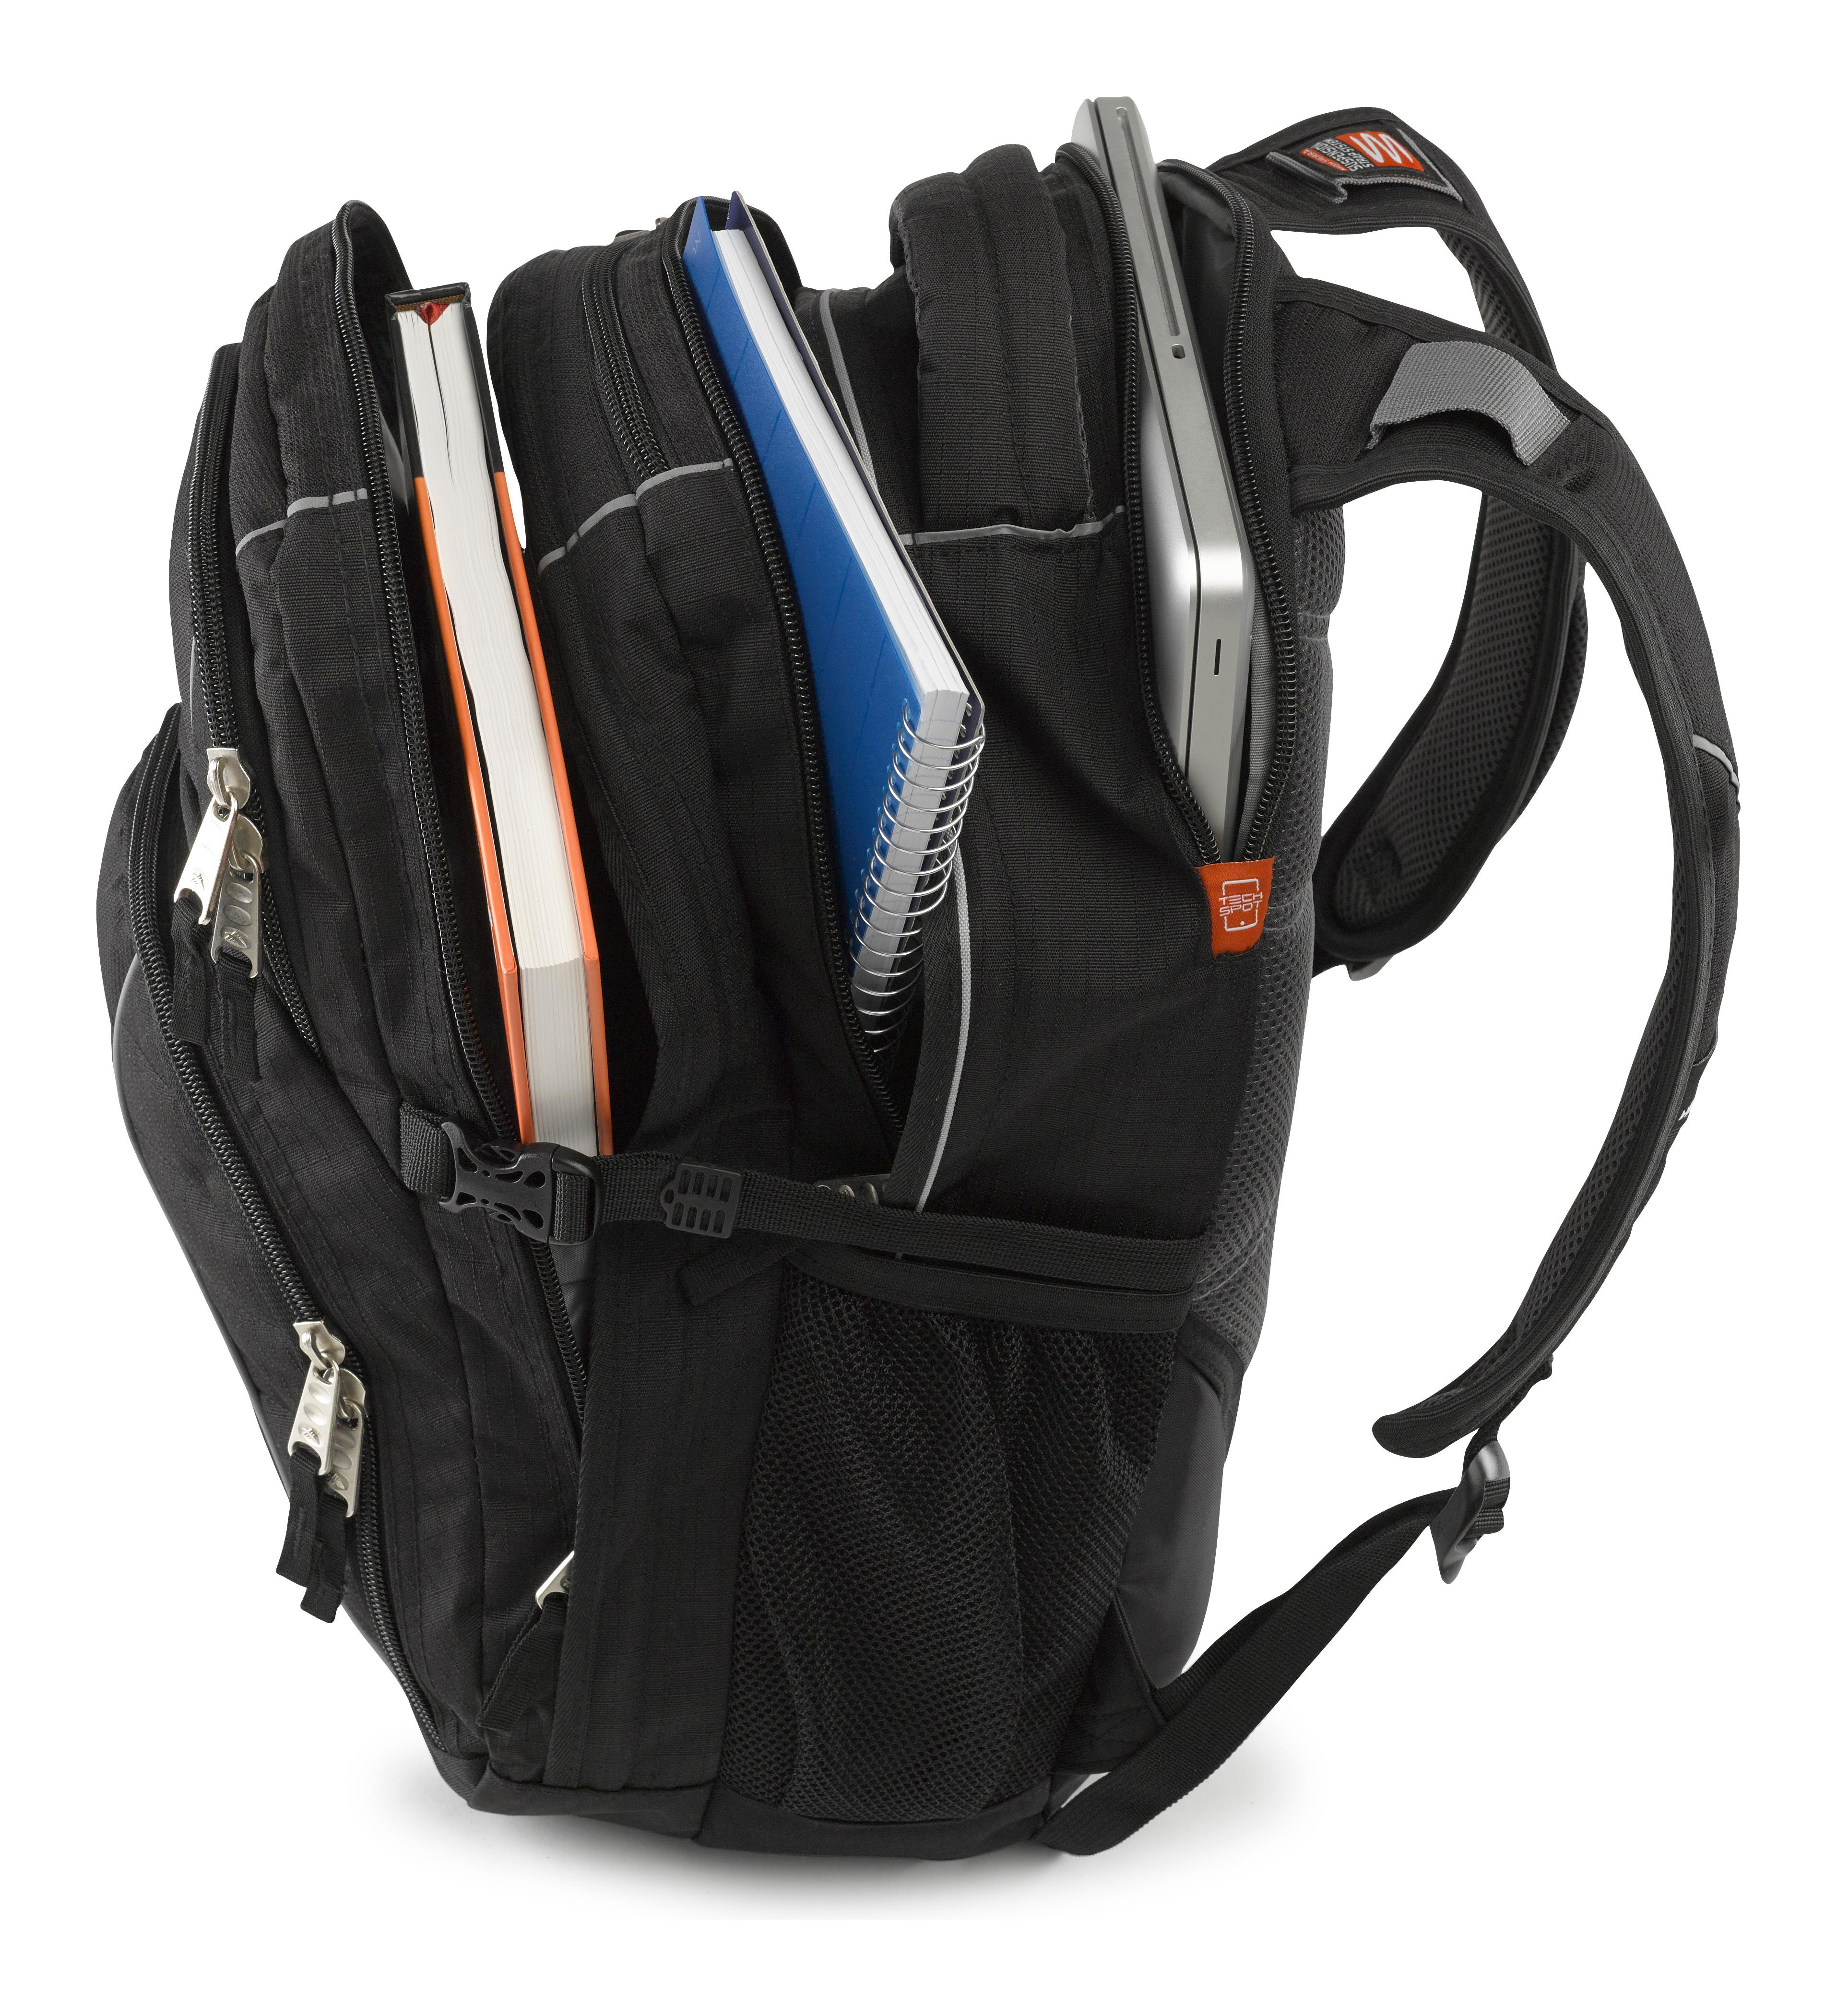 Amazon.com: High Sierra Swerve Backpack, Royal Cobalt/Black, 19 x 13 x